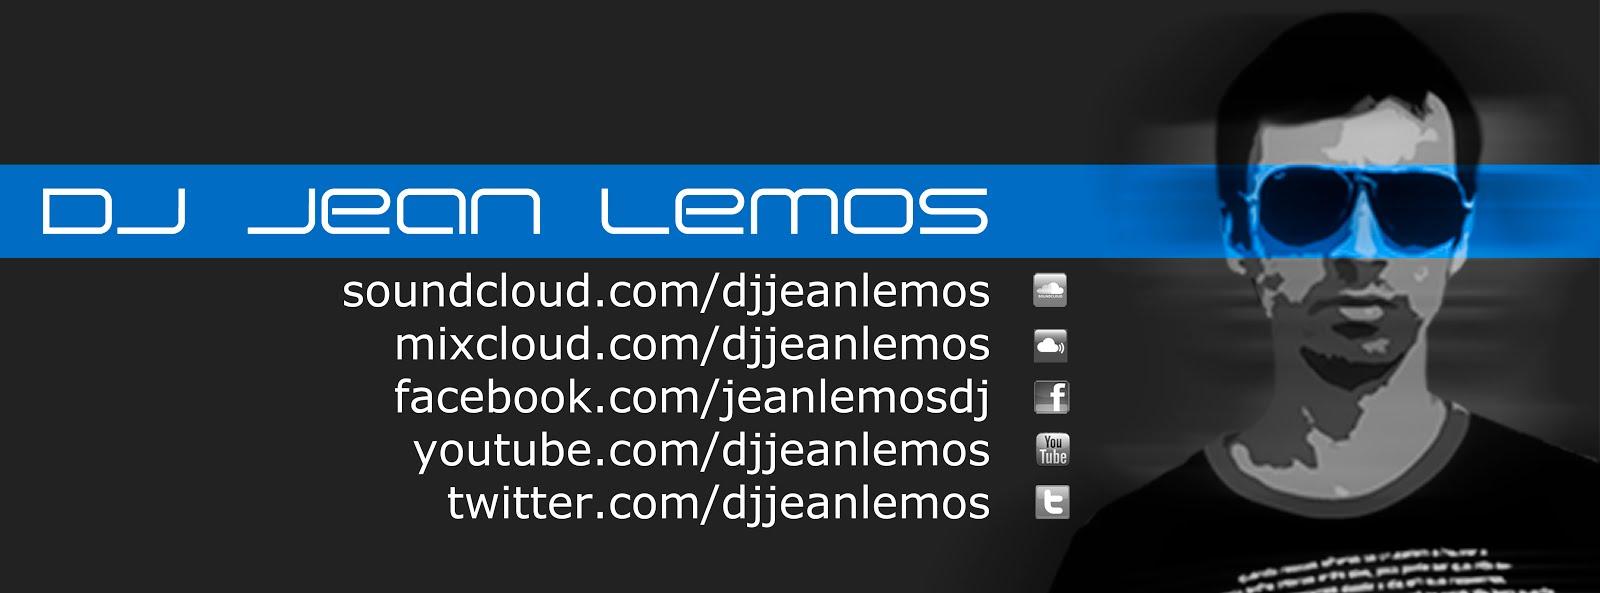 Dj Jean Lemos